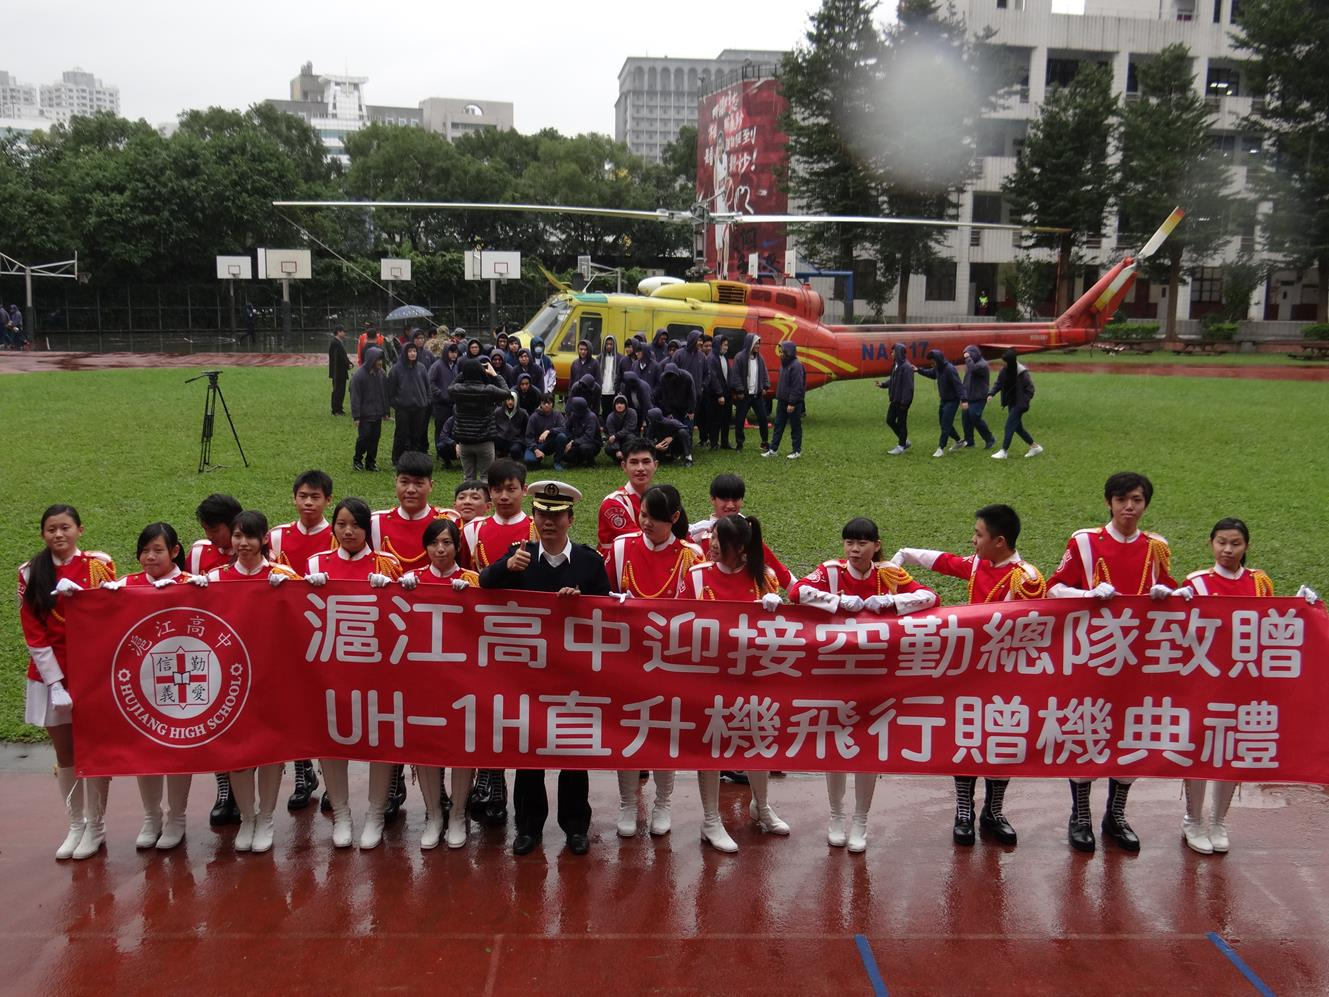 UH-1H型直升機贈與私立滬江高中(共十張).jpg